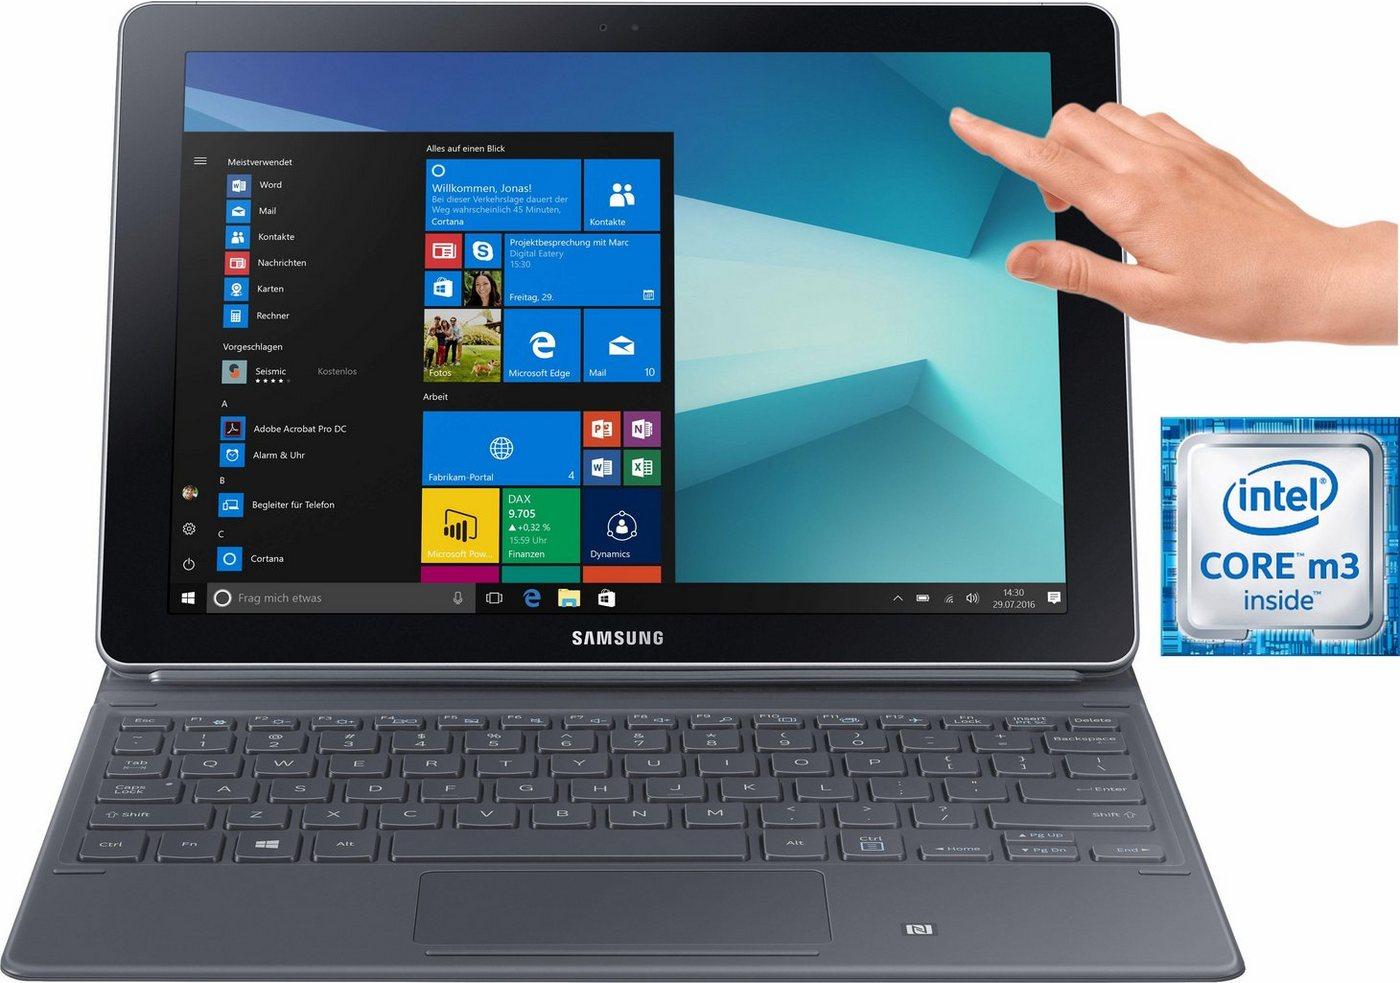 Samsung Galaxy Book 10.6 WiFi Convertible Notebook (Intel Core m3)